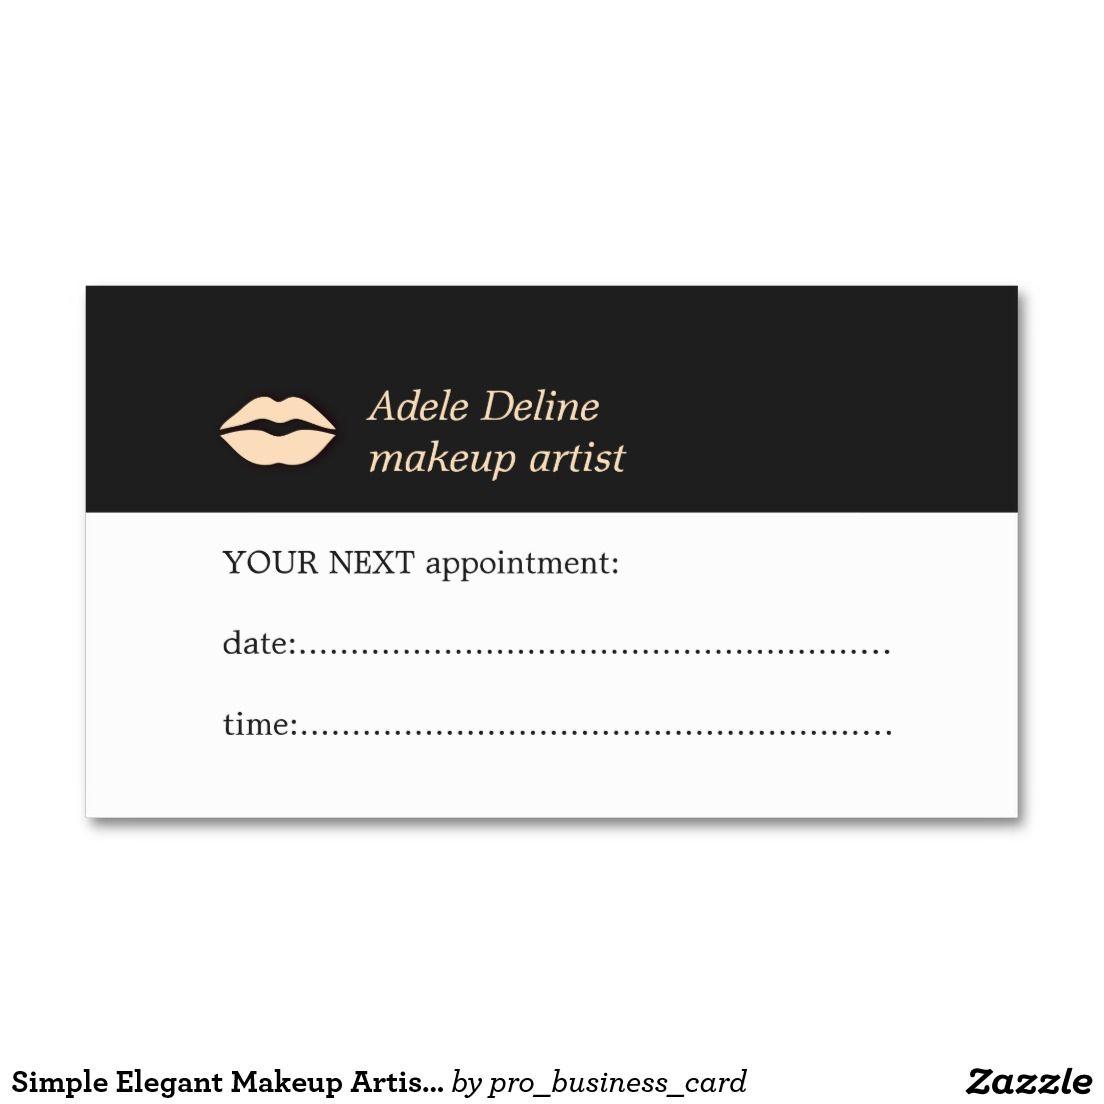 Simple Elegant Makeup Artist Appointment Card | Elegant makeup ...